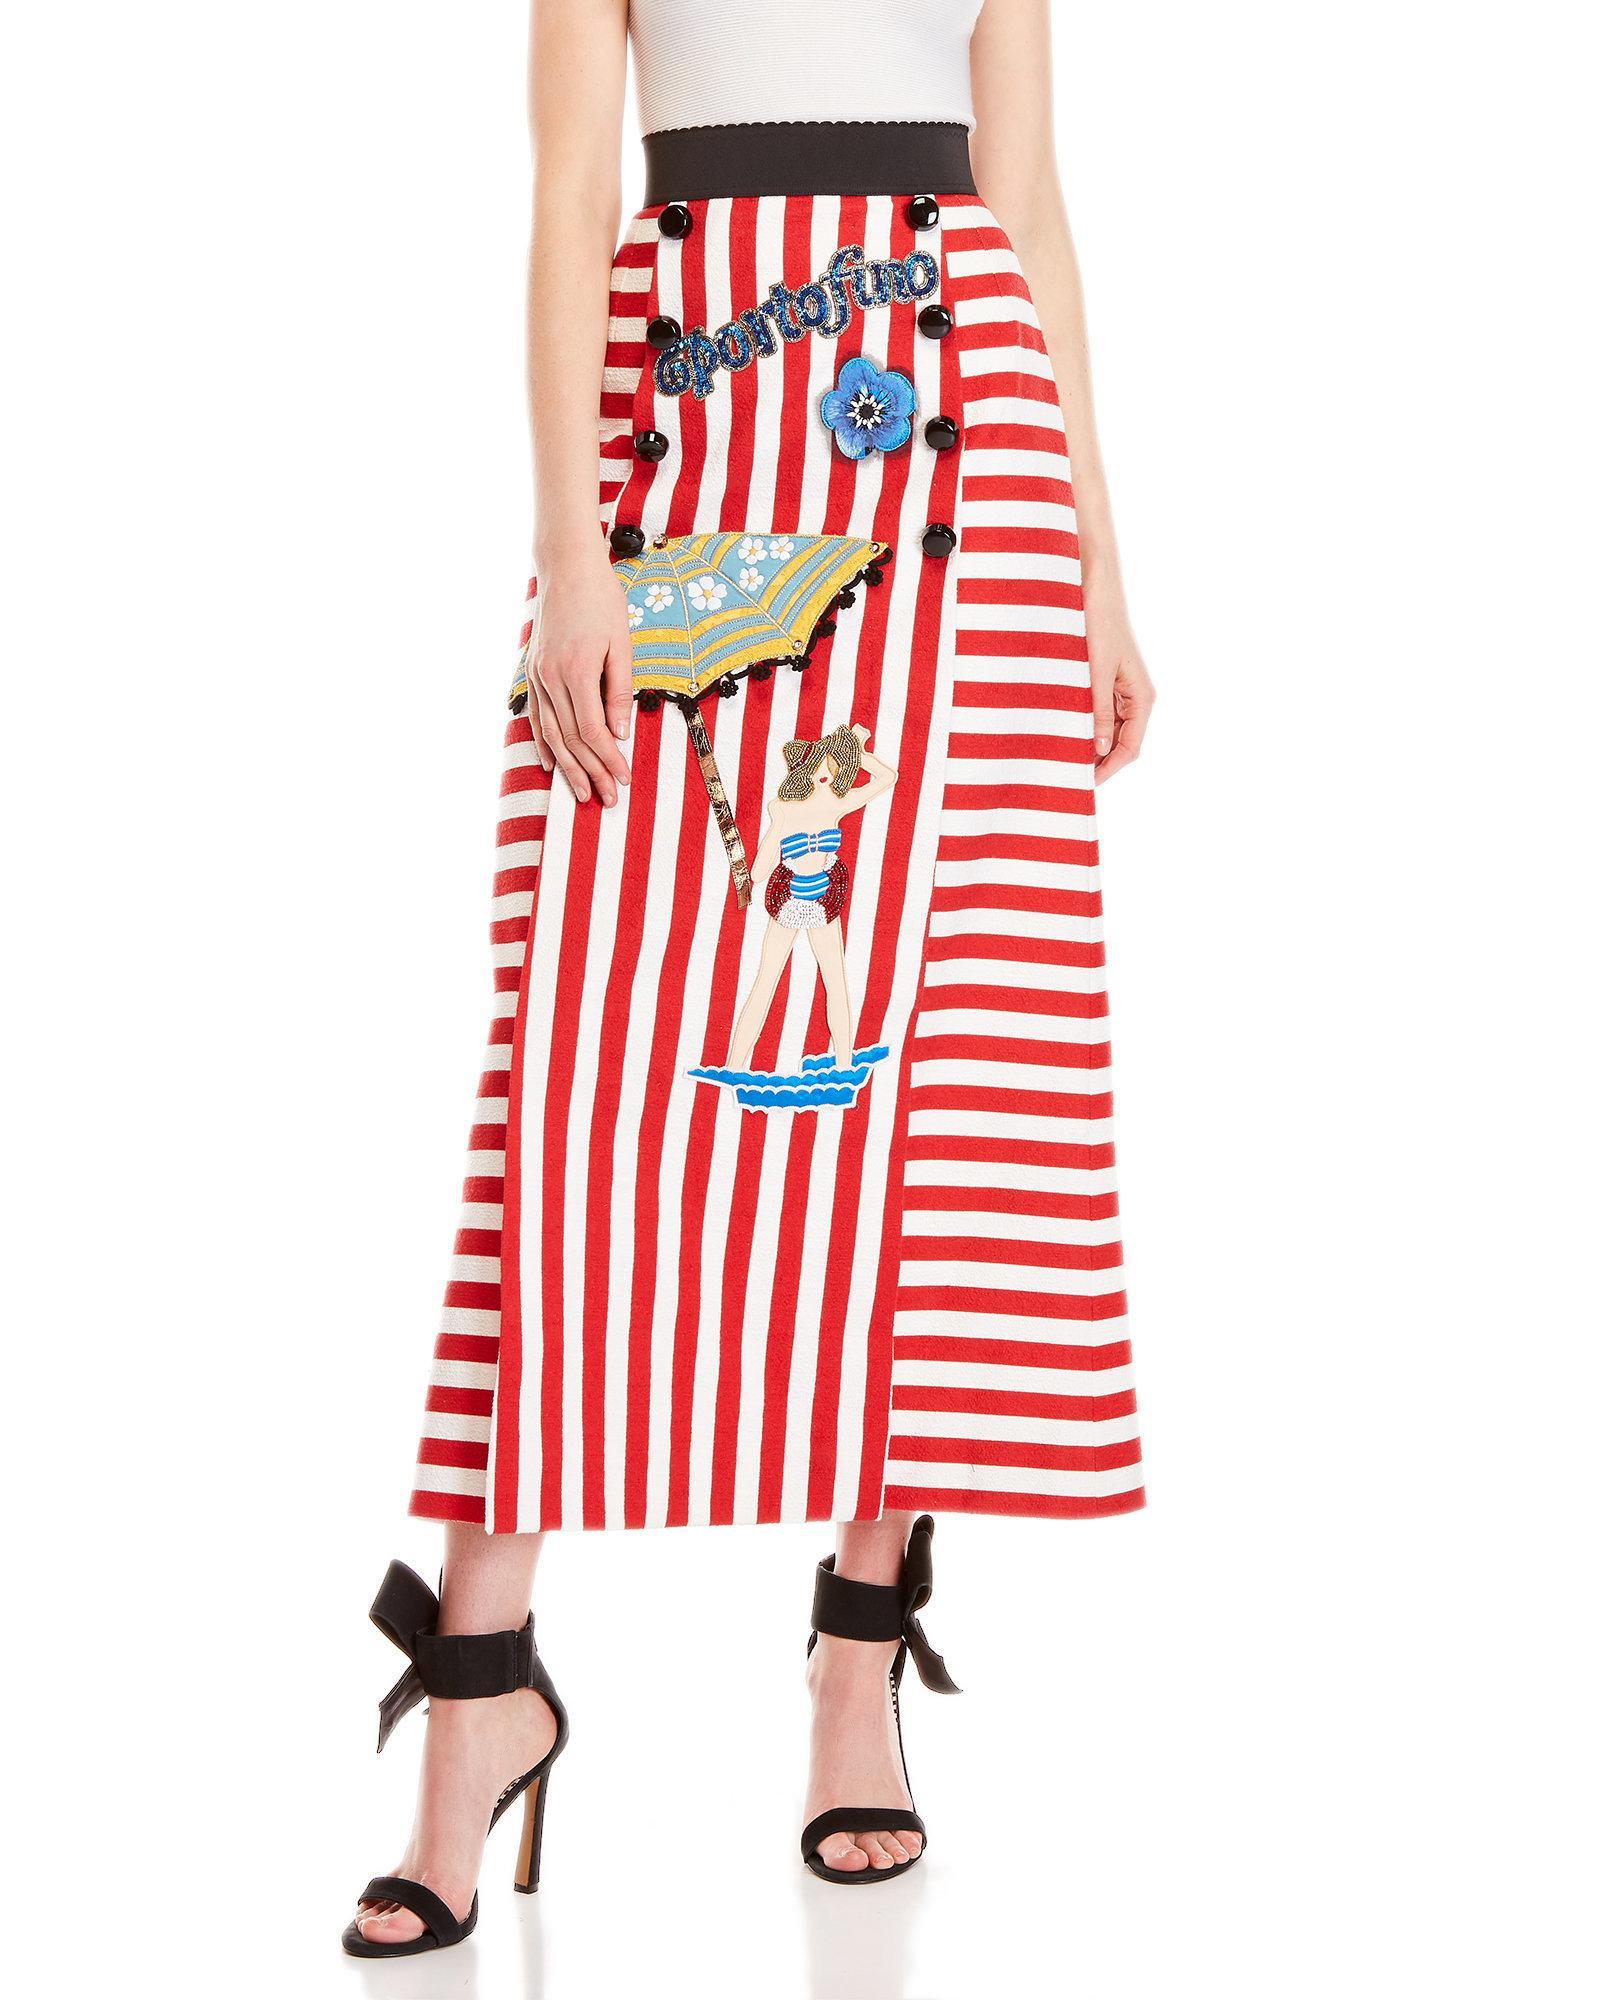 d2e00106ef Red And White Striped Maxi Skirt | Saddha